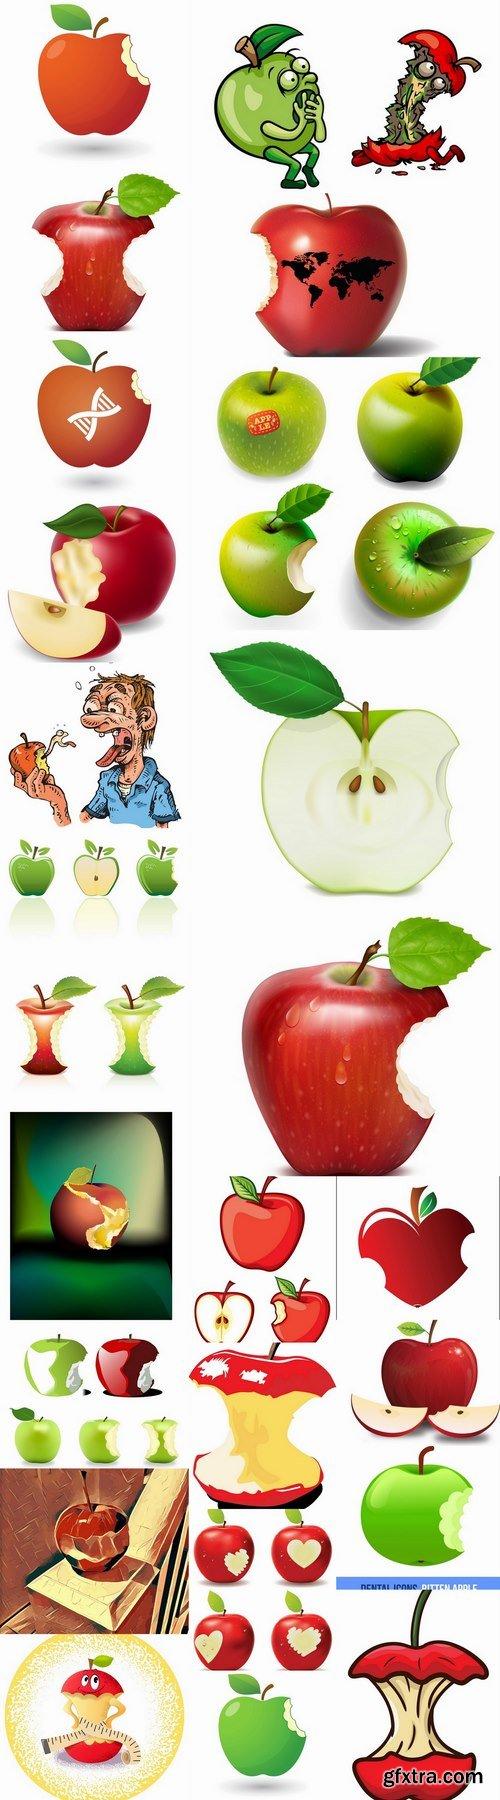 Bitten apple trace of teeth fruit vector image 25 EPS